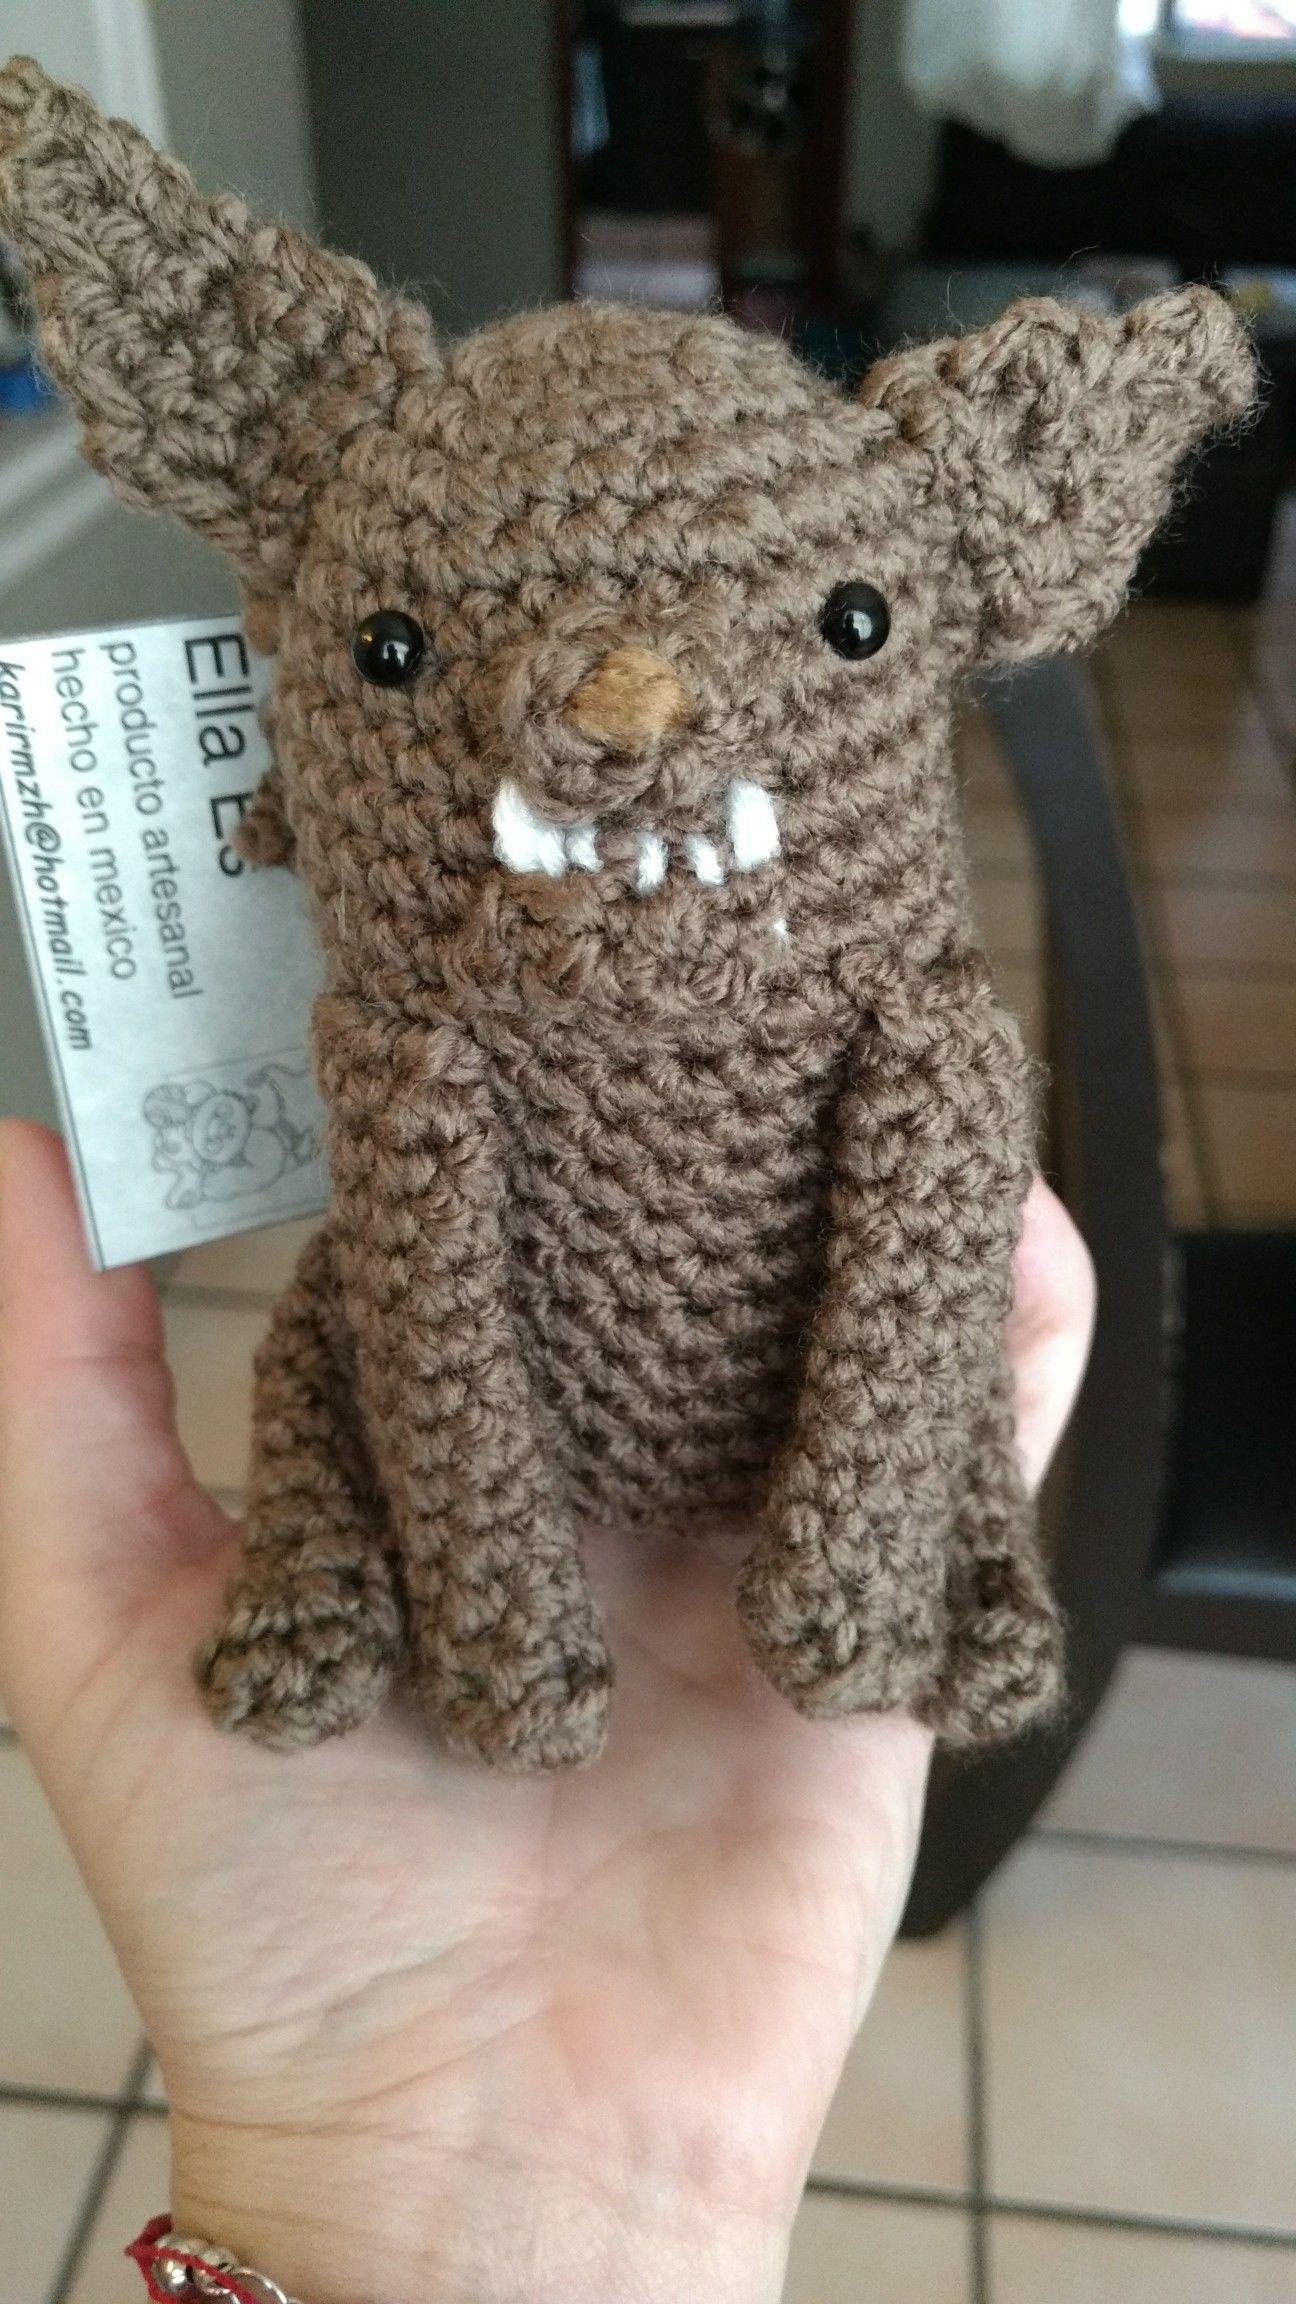 Perro chilaquil a crochet | crochet | Pinterest | Patrones amigurumi ...